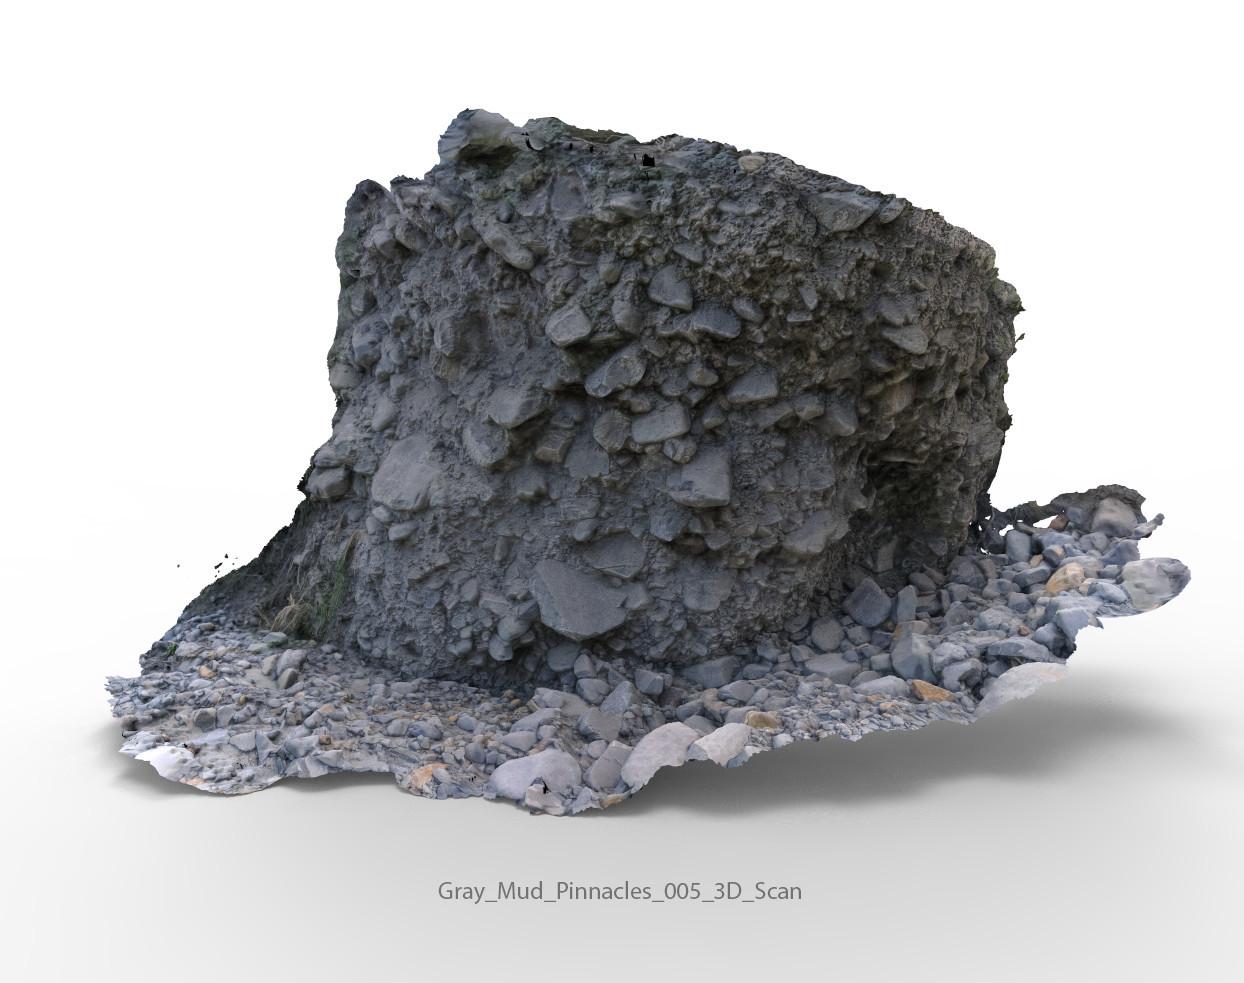 https://www.fotoref.com/products/gray-mud-pinnacles#3d-scan